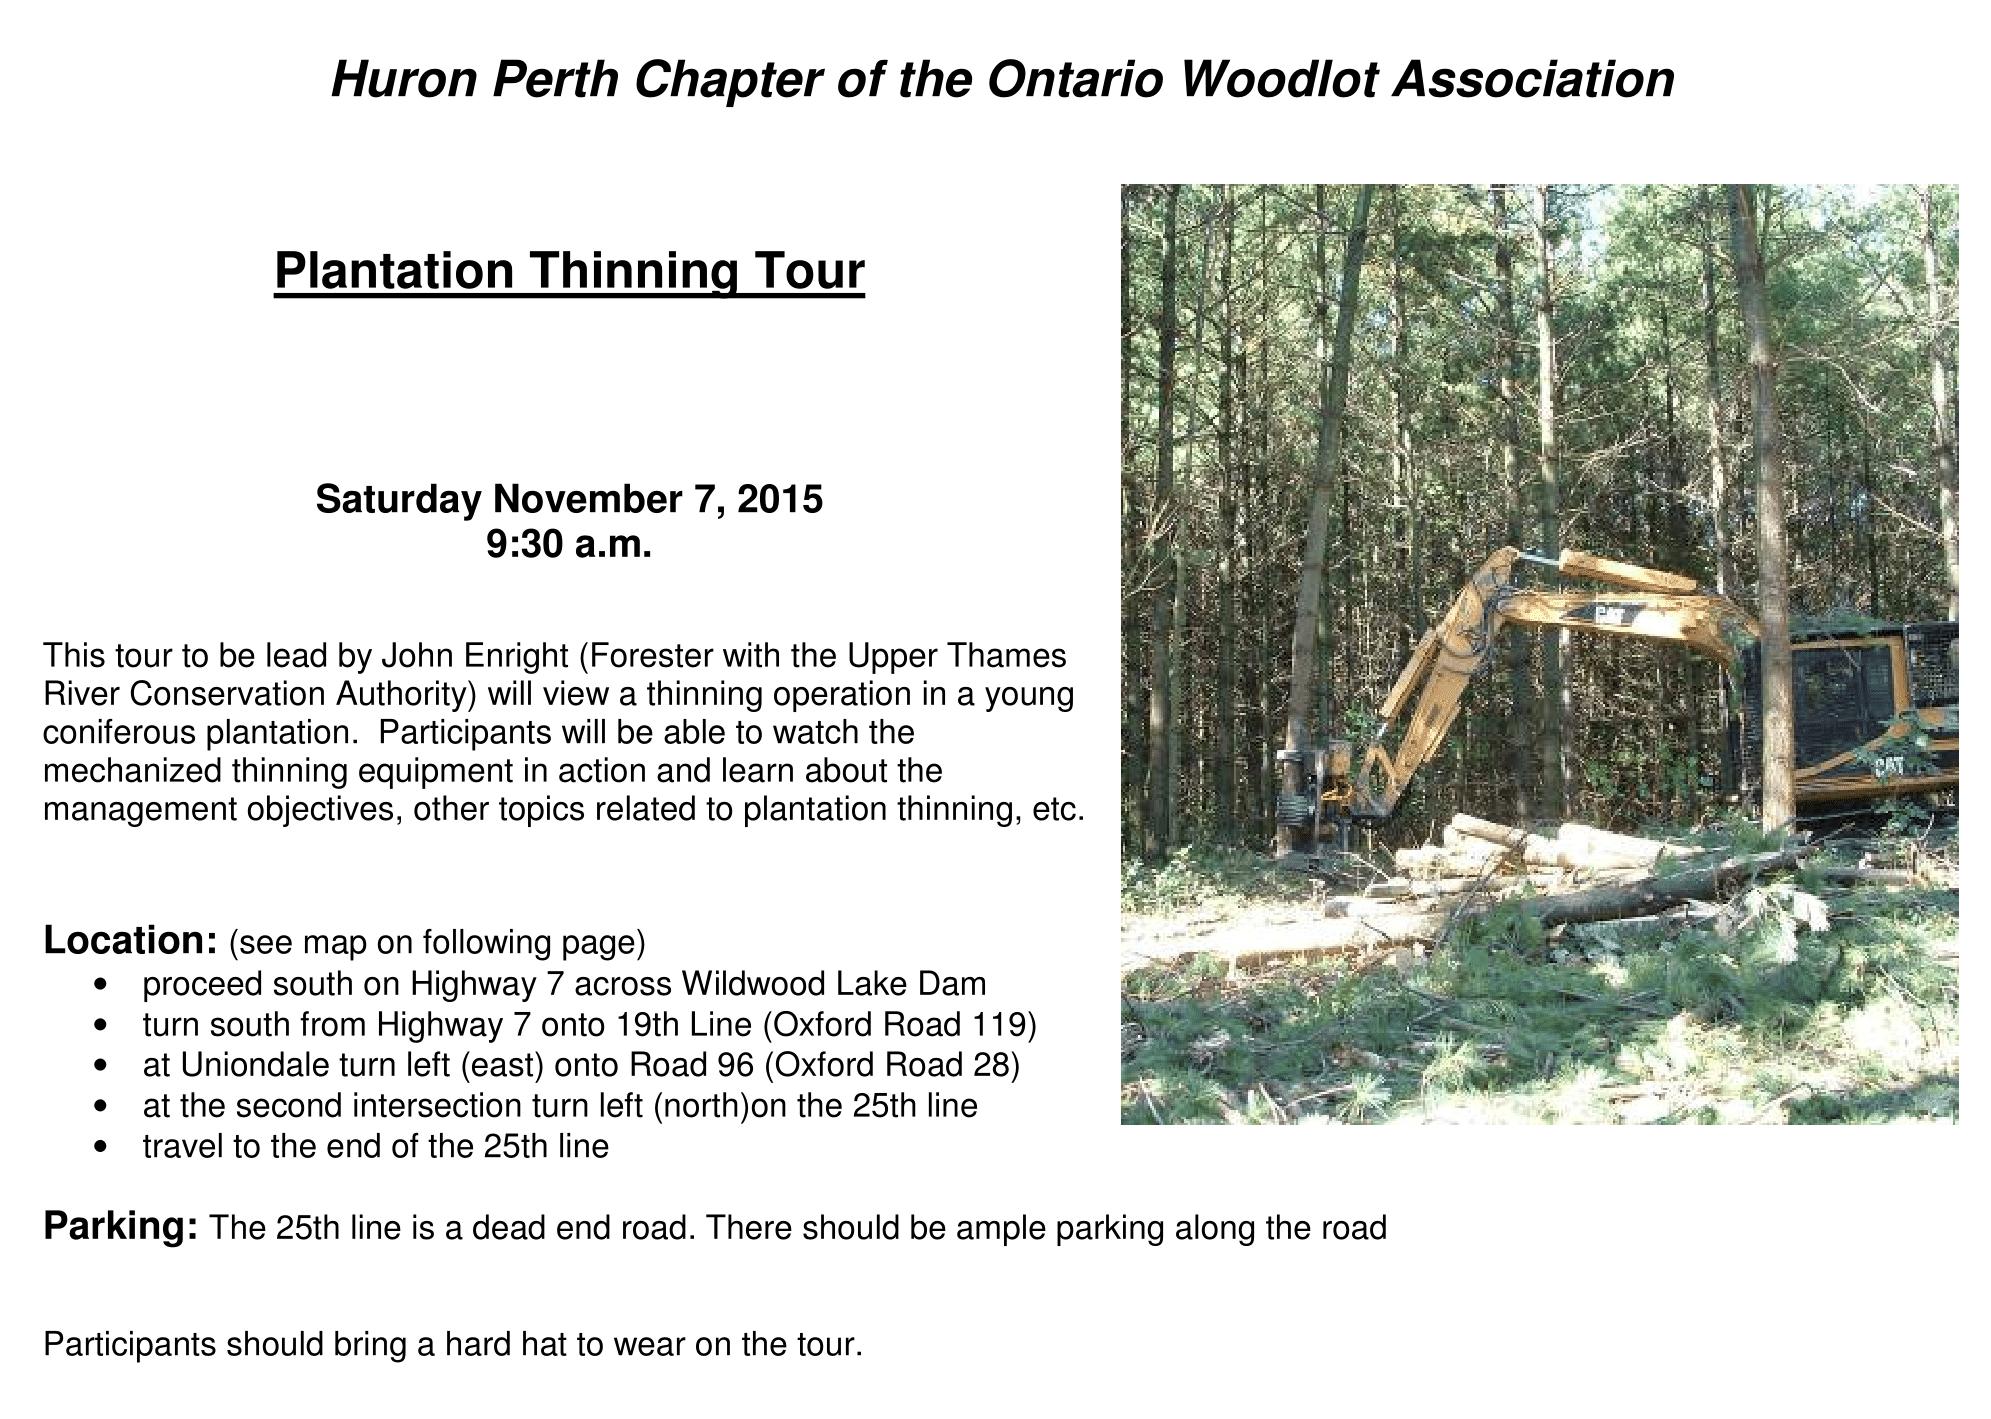 Plantation Thinning Tour Nov 7, 2015 compressed-1